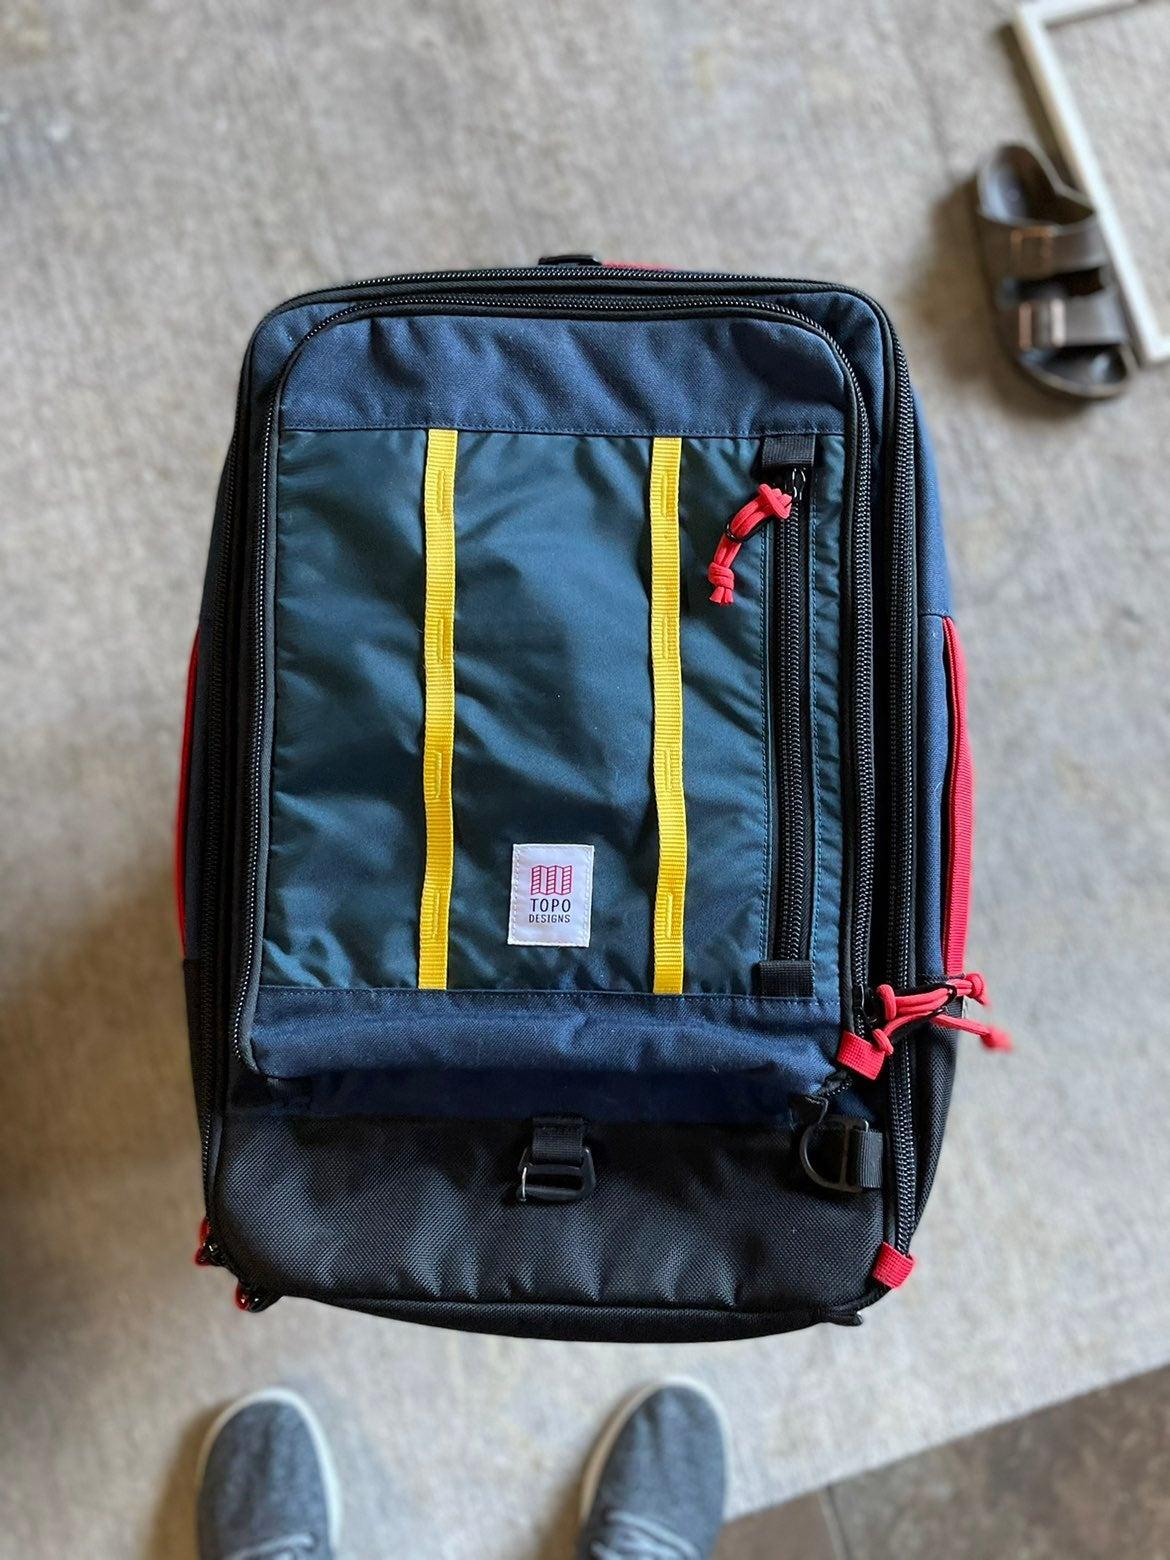 Topo designs 30L travel bag